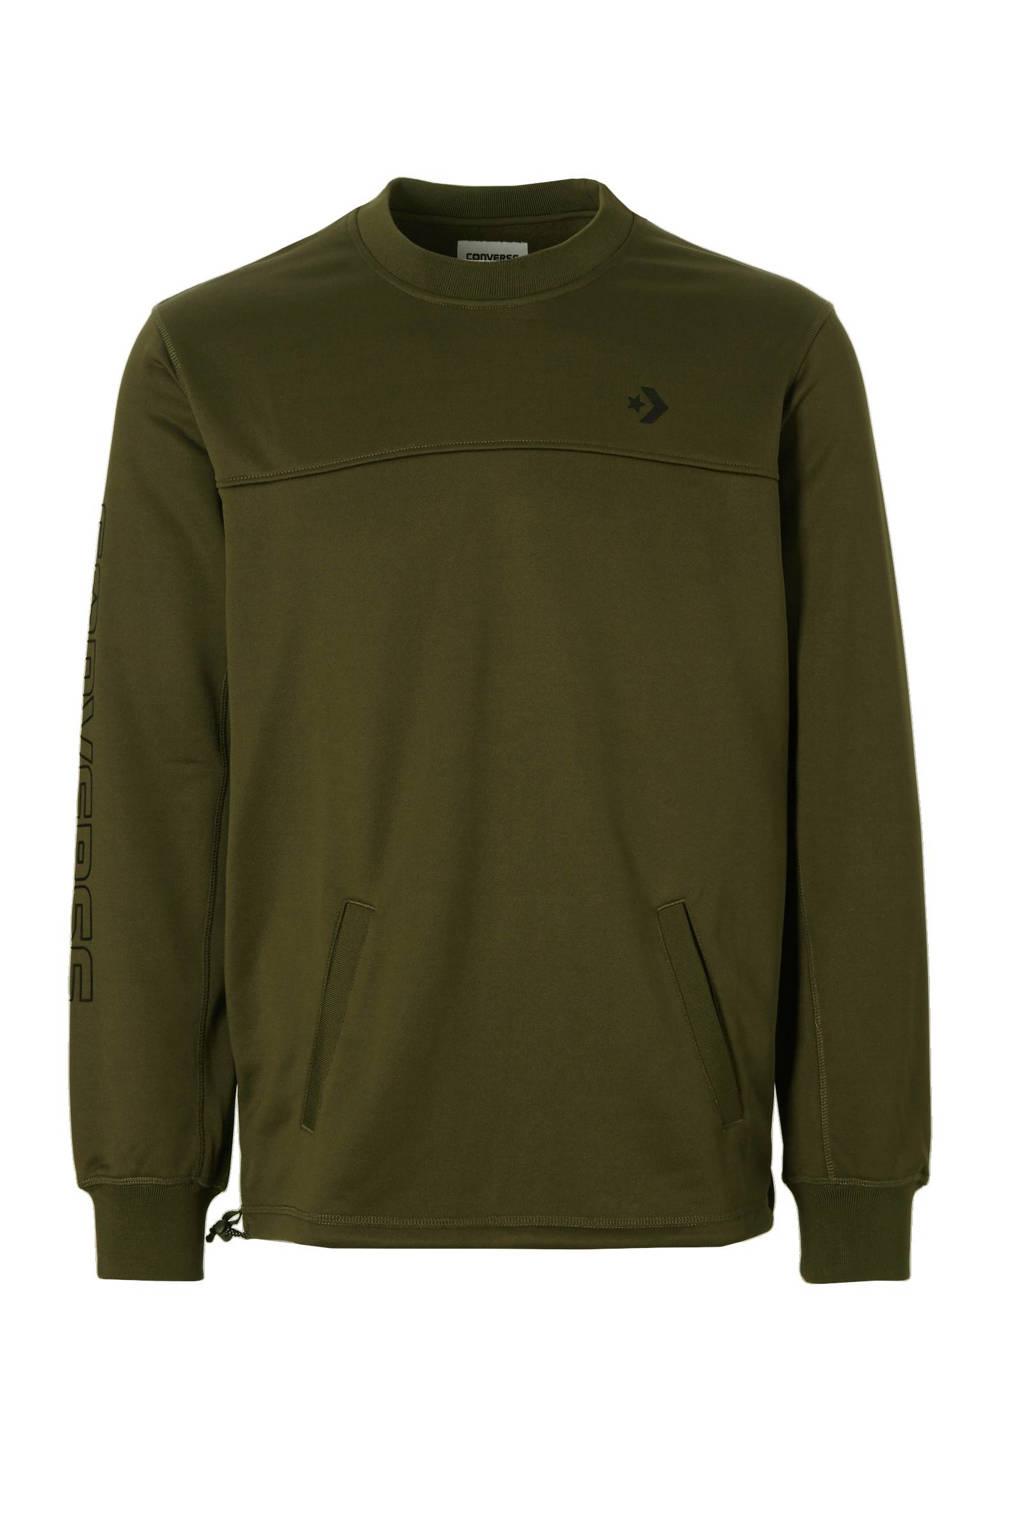 23724aad14336c Converse sweater | wehkamp